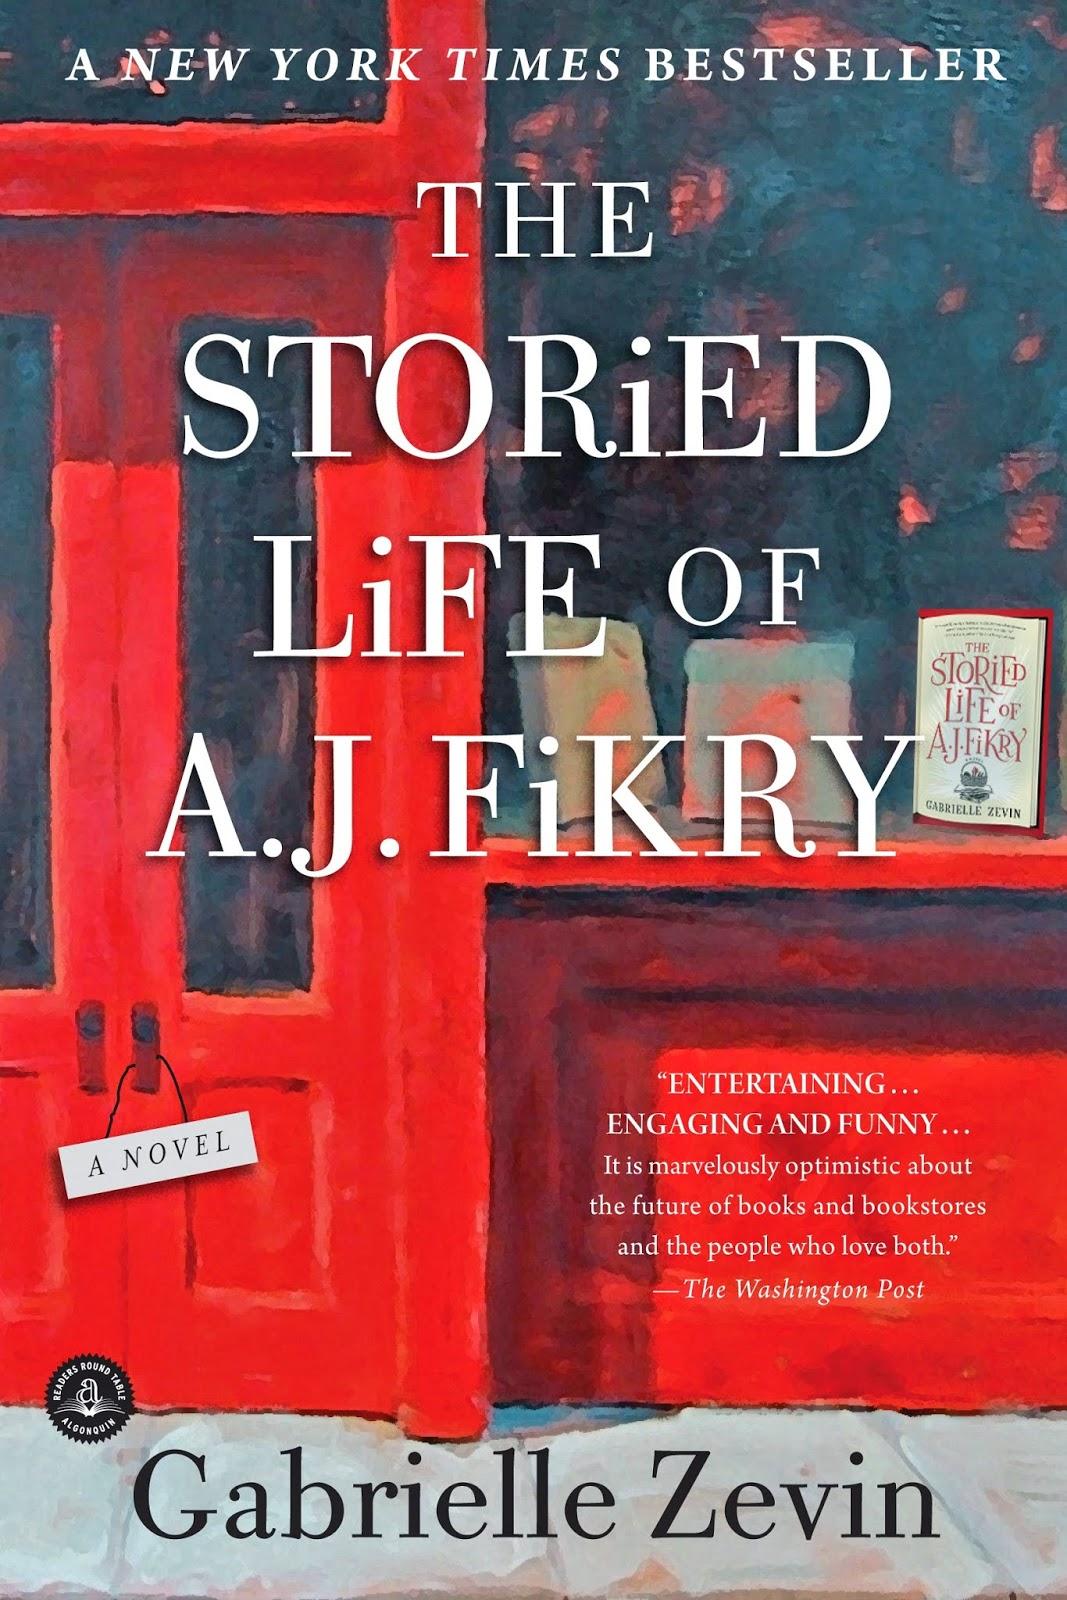 Bildergebnis für the storied life of a.j. fikry